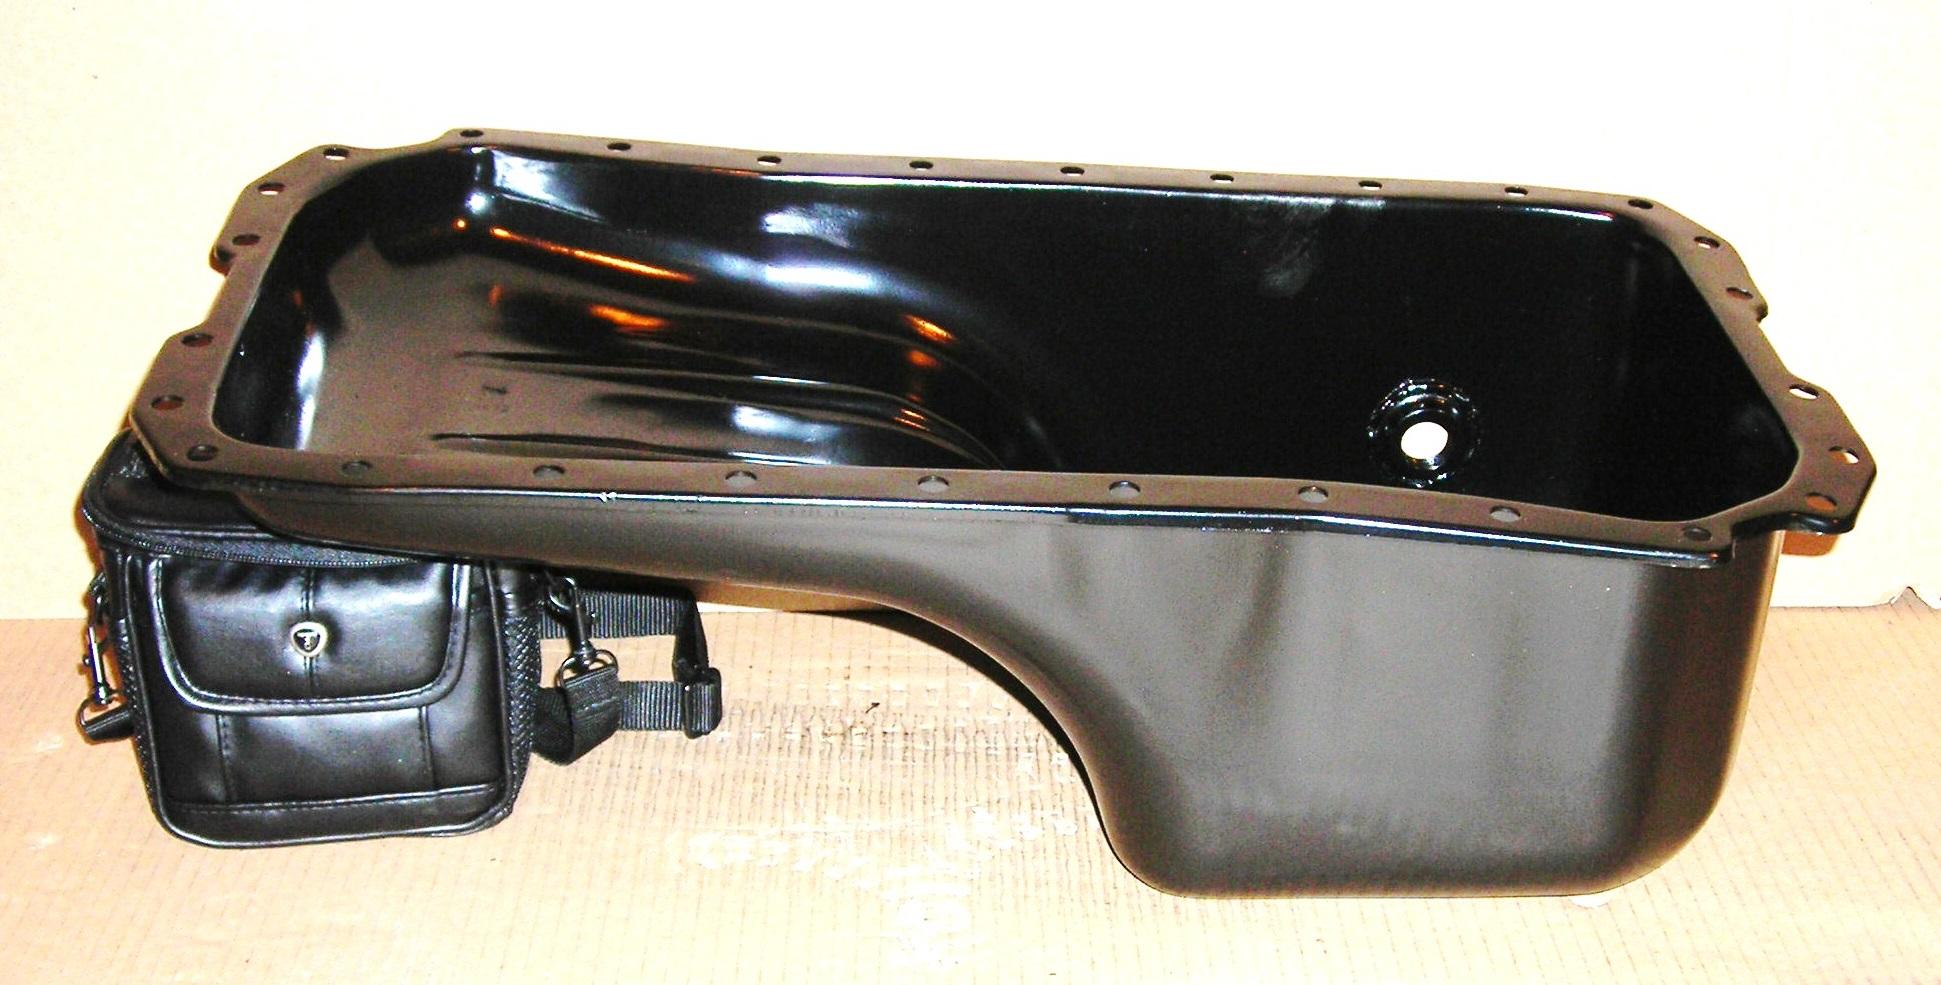 3901049 Cummins Oil Pan - View #2 - fixed